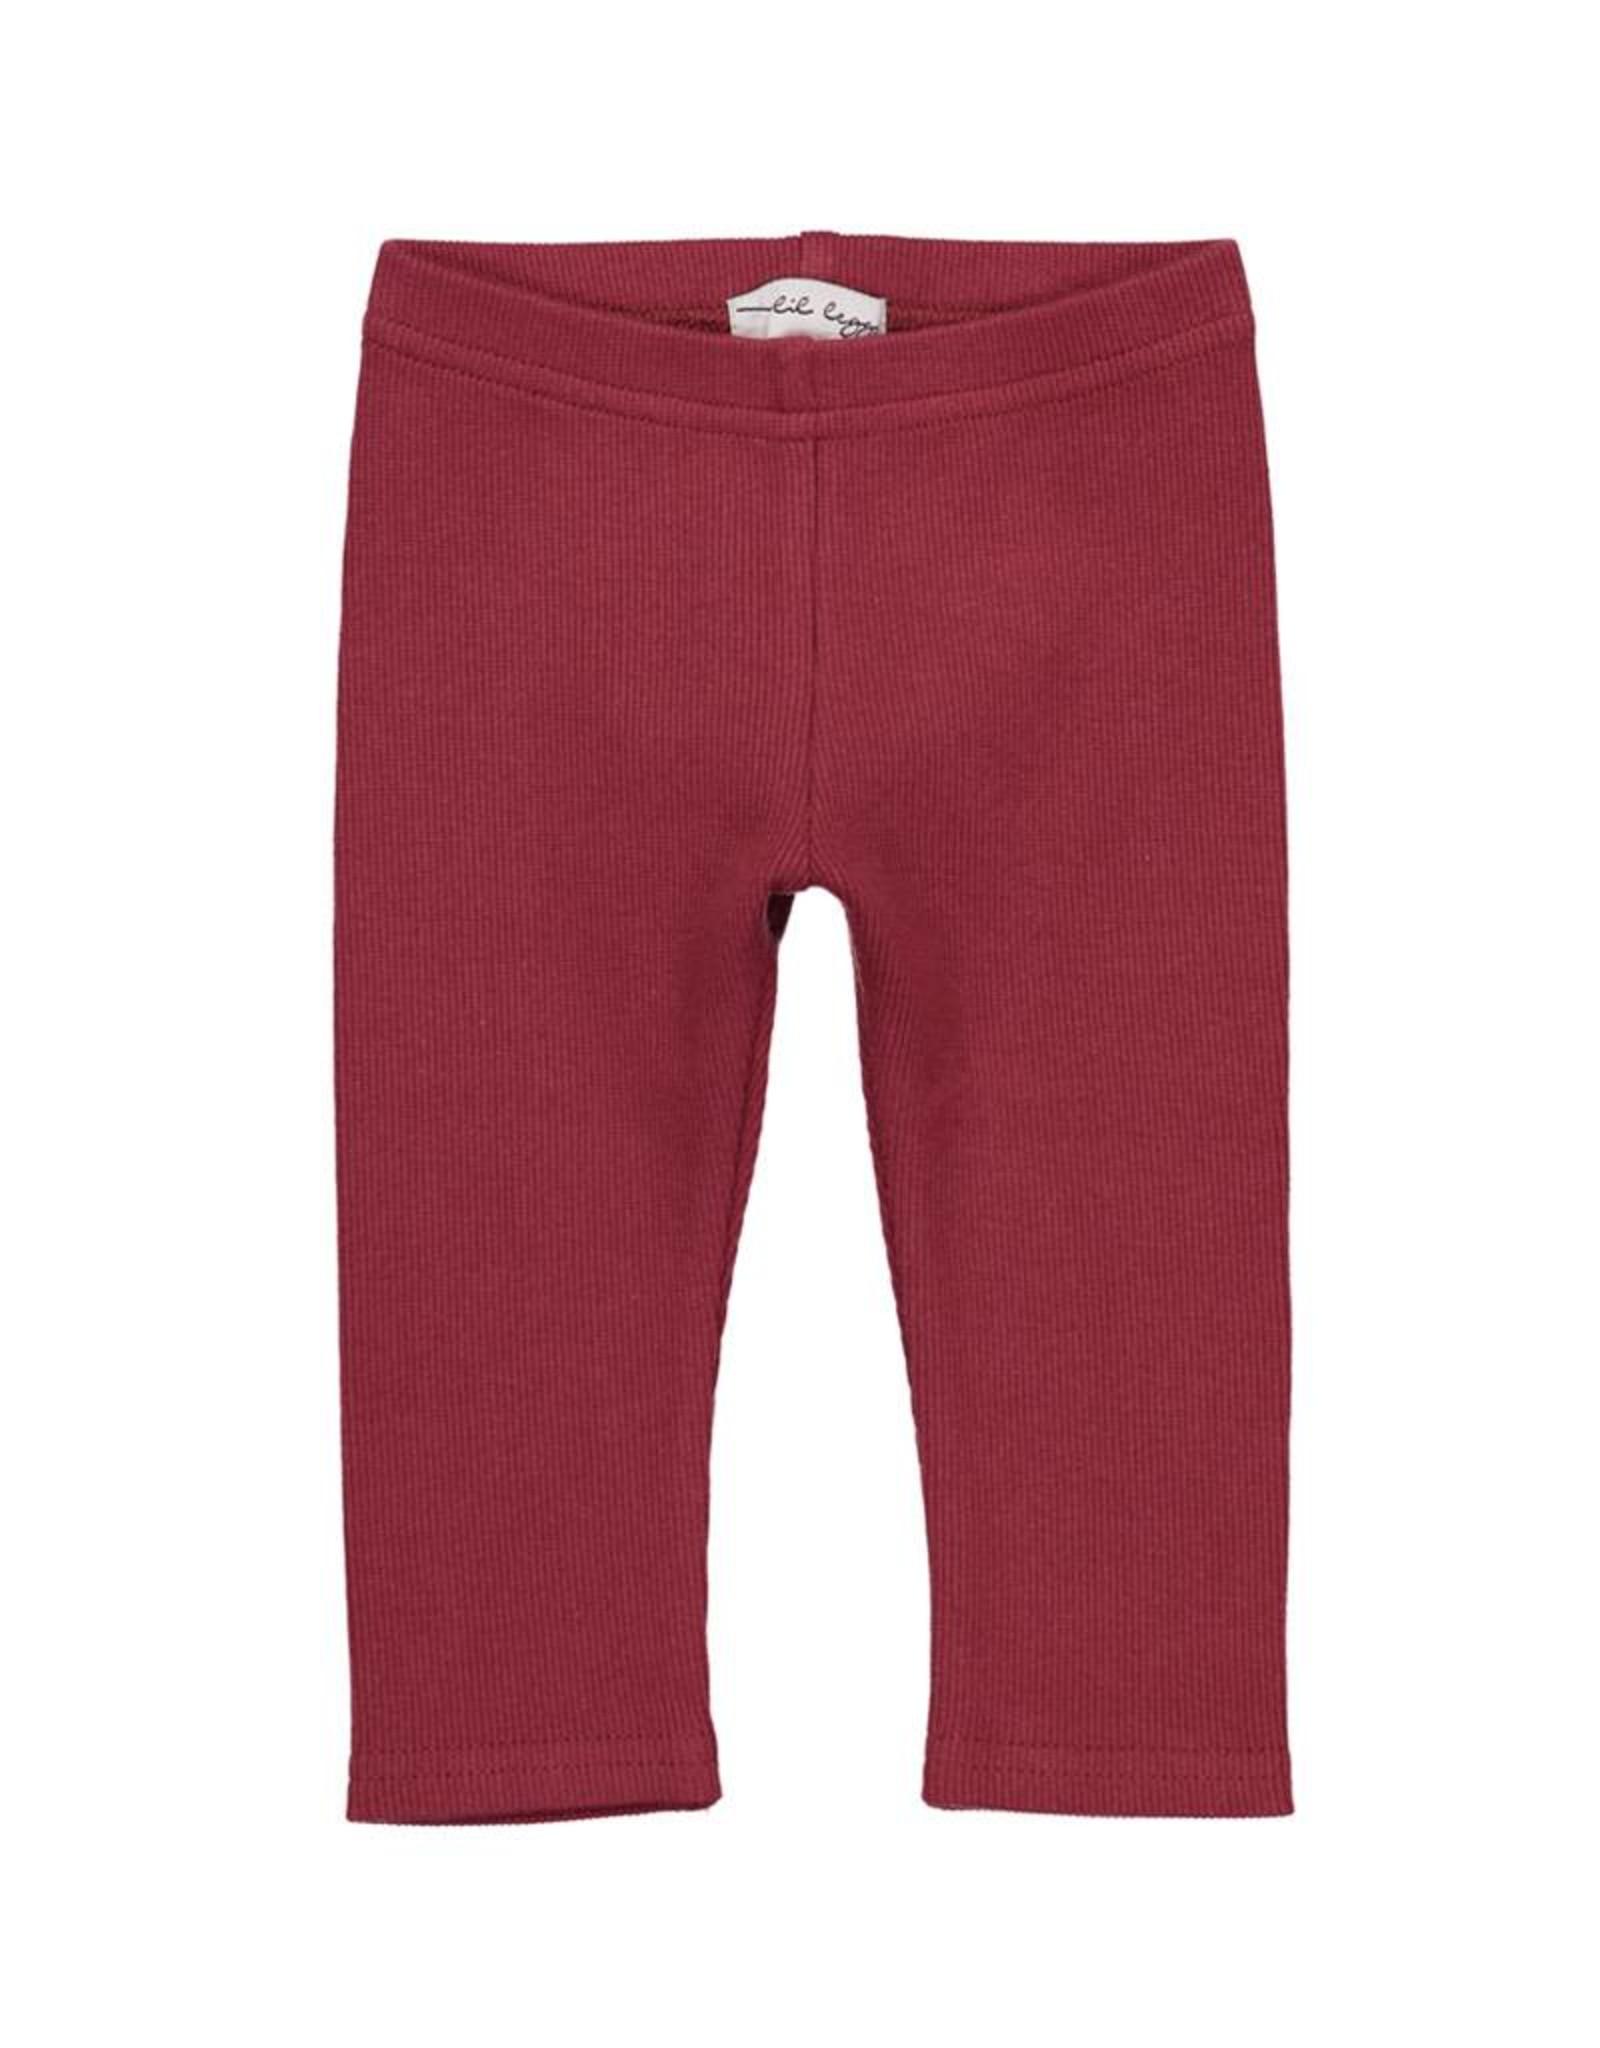 LIL LEGS FW Rib Leggings Basic Colors